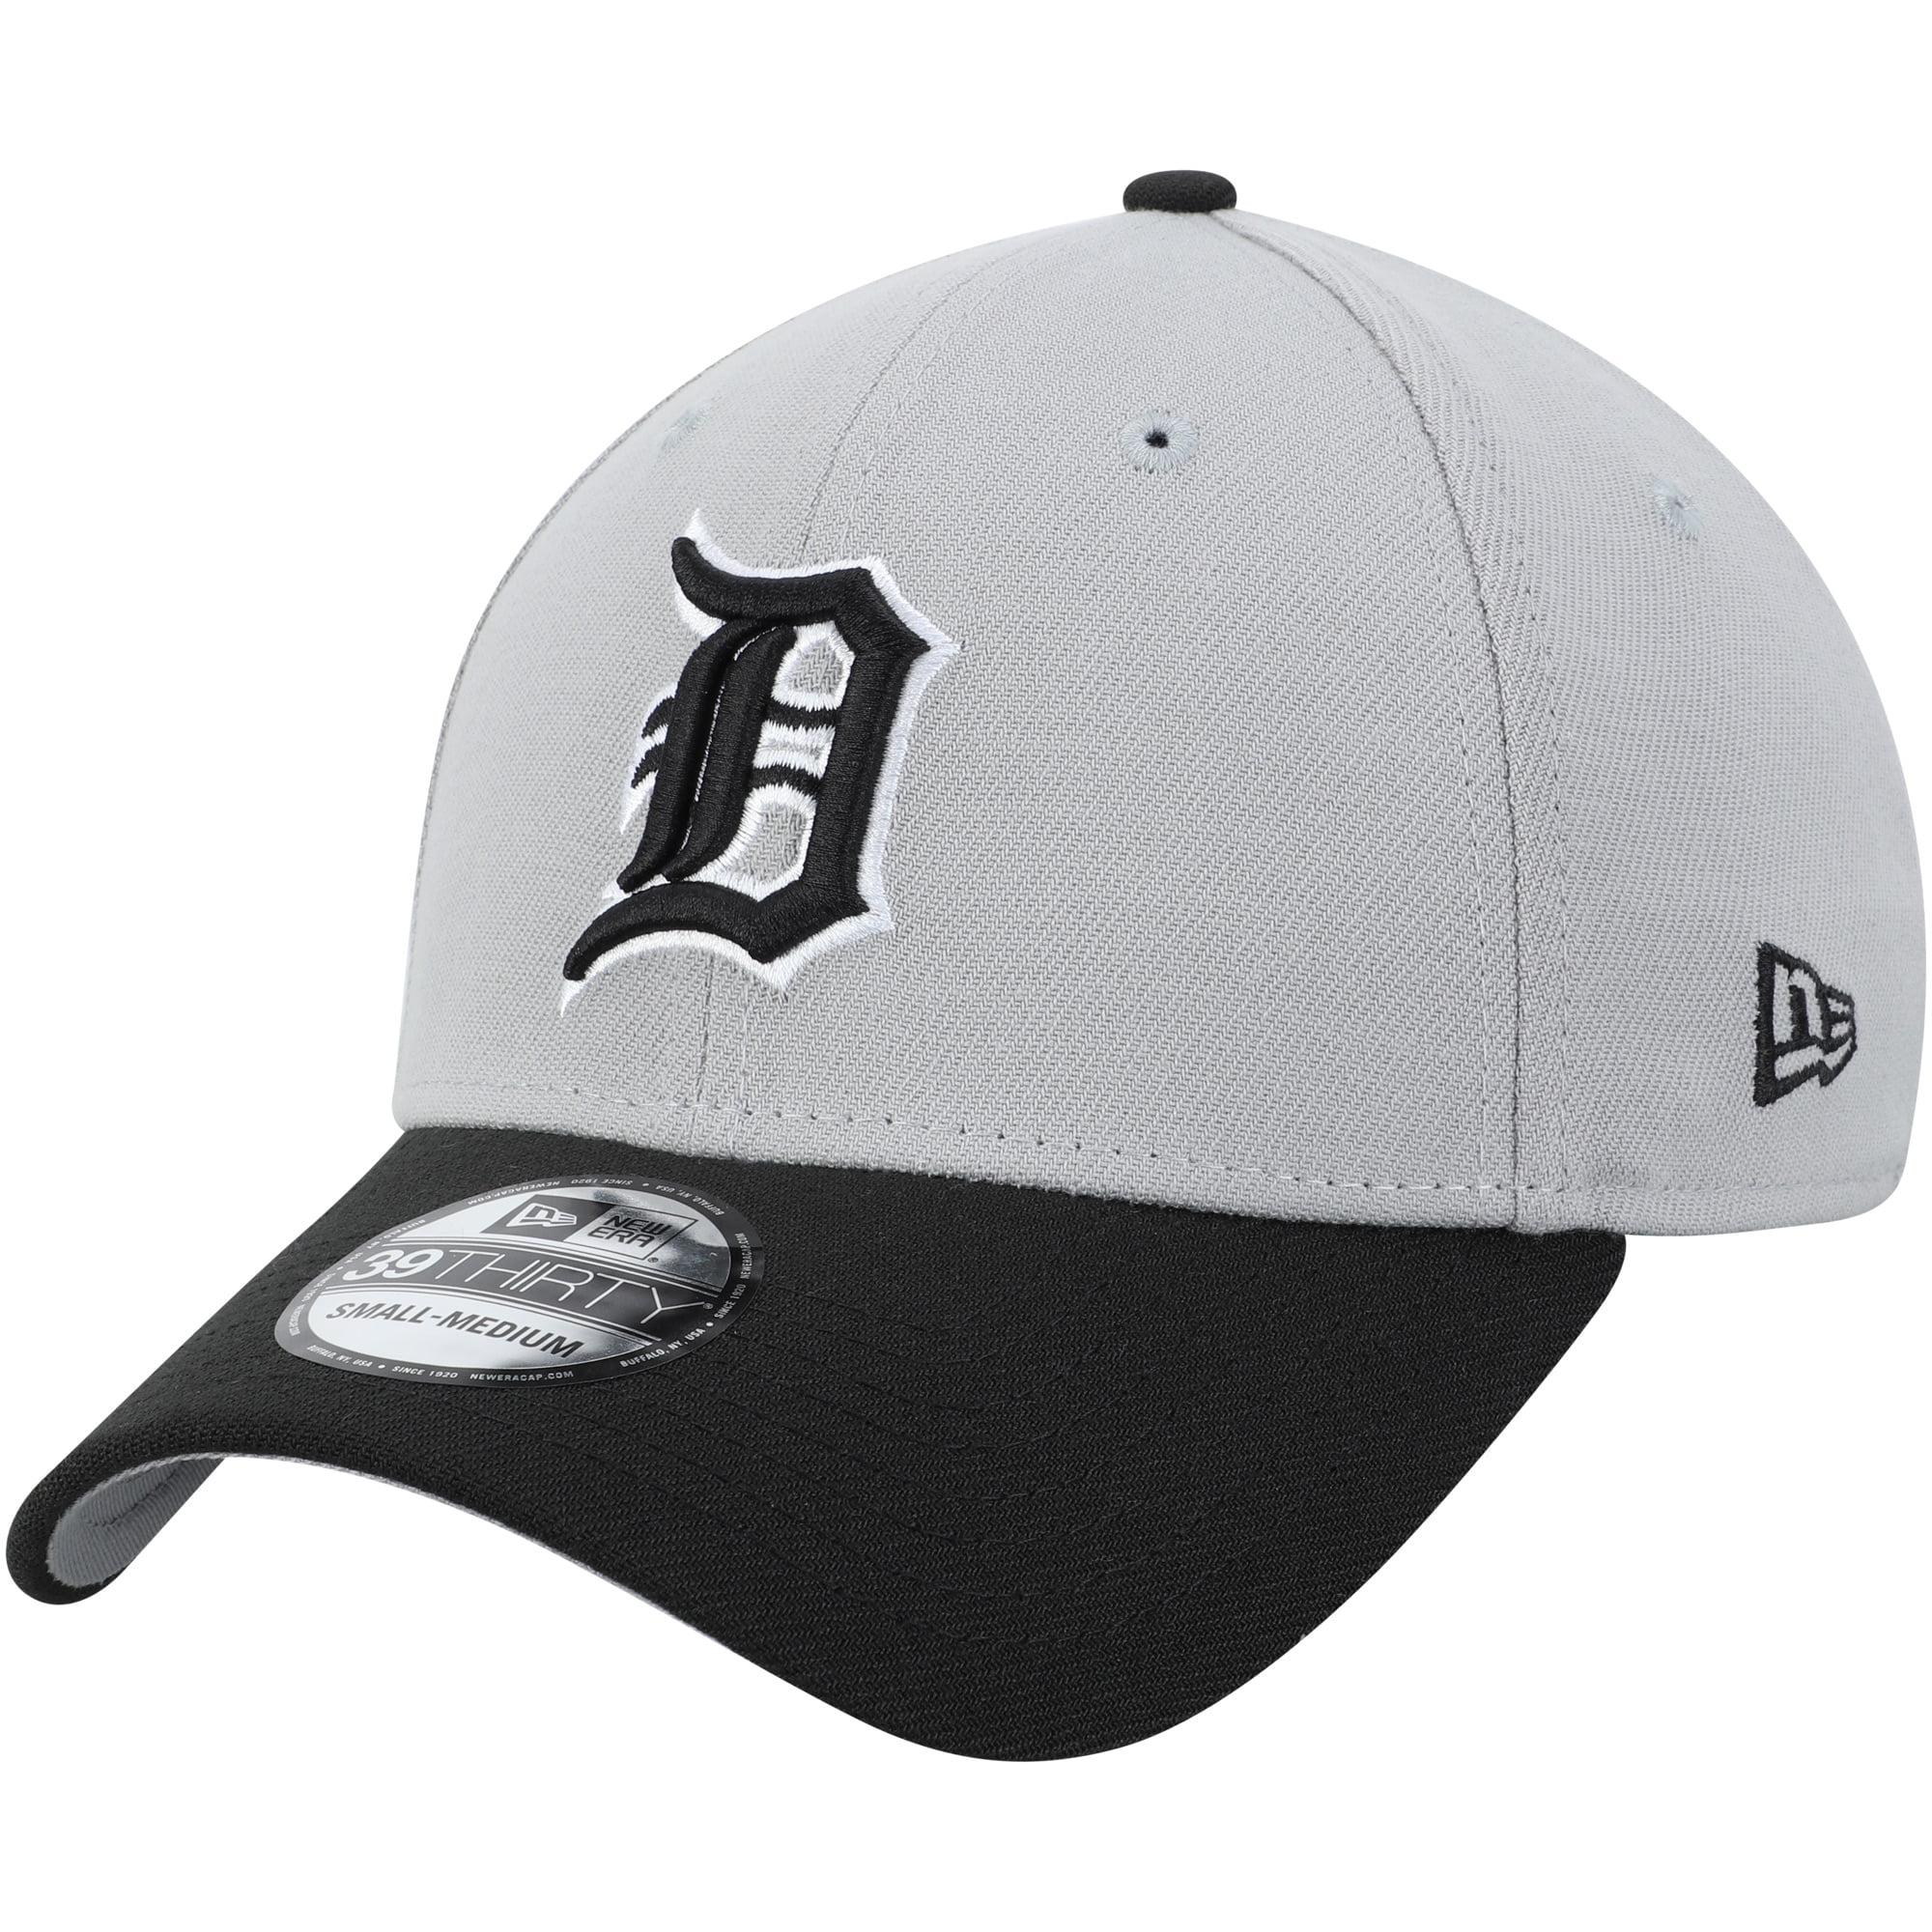 Detroit Tigers New Era Team Classic 39THIRTY Flex Hat - Gray/Black